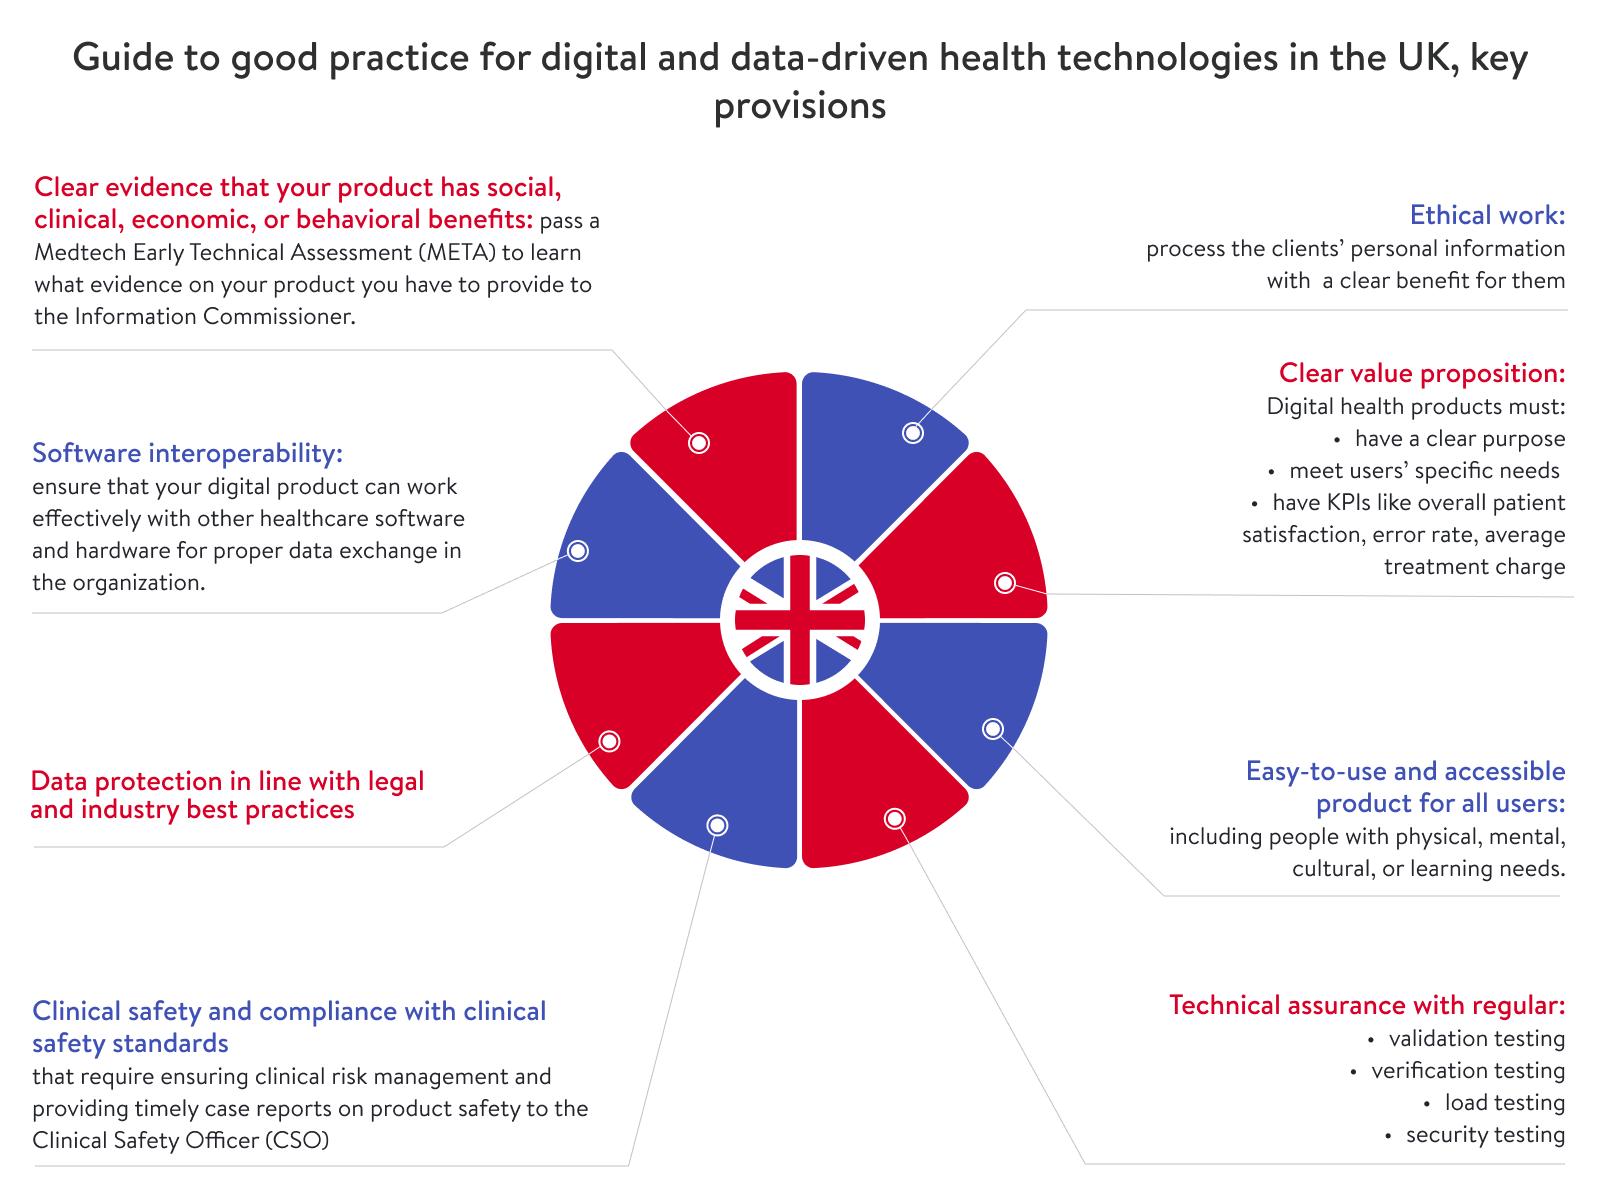 uk key data privacy provisions